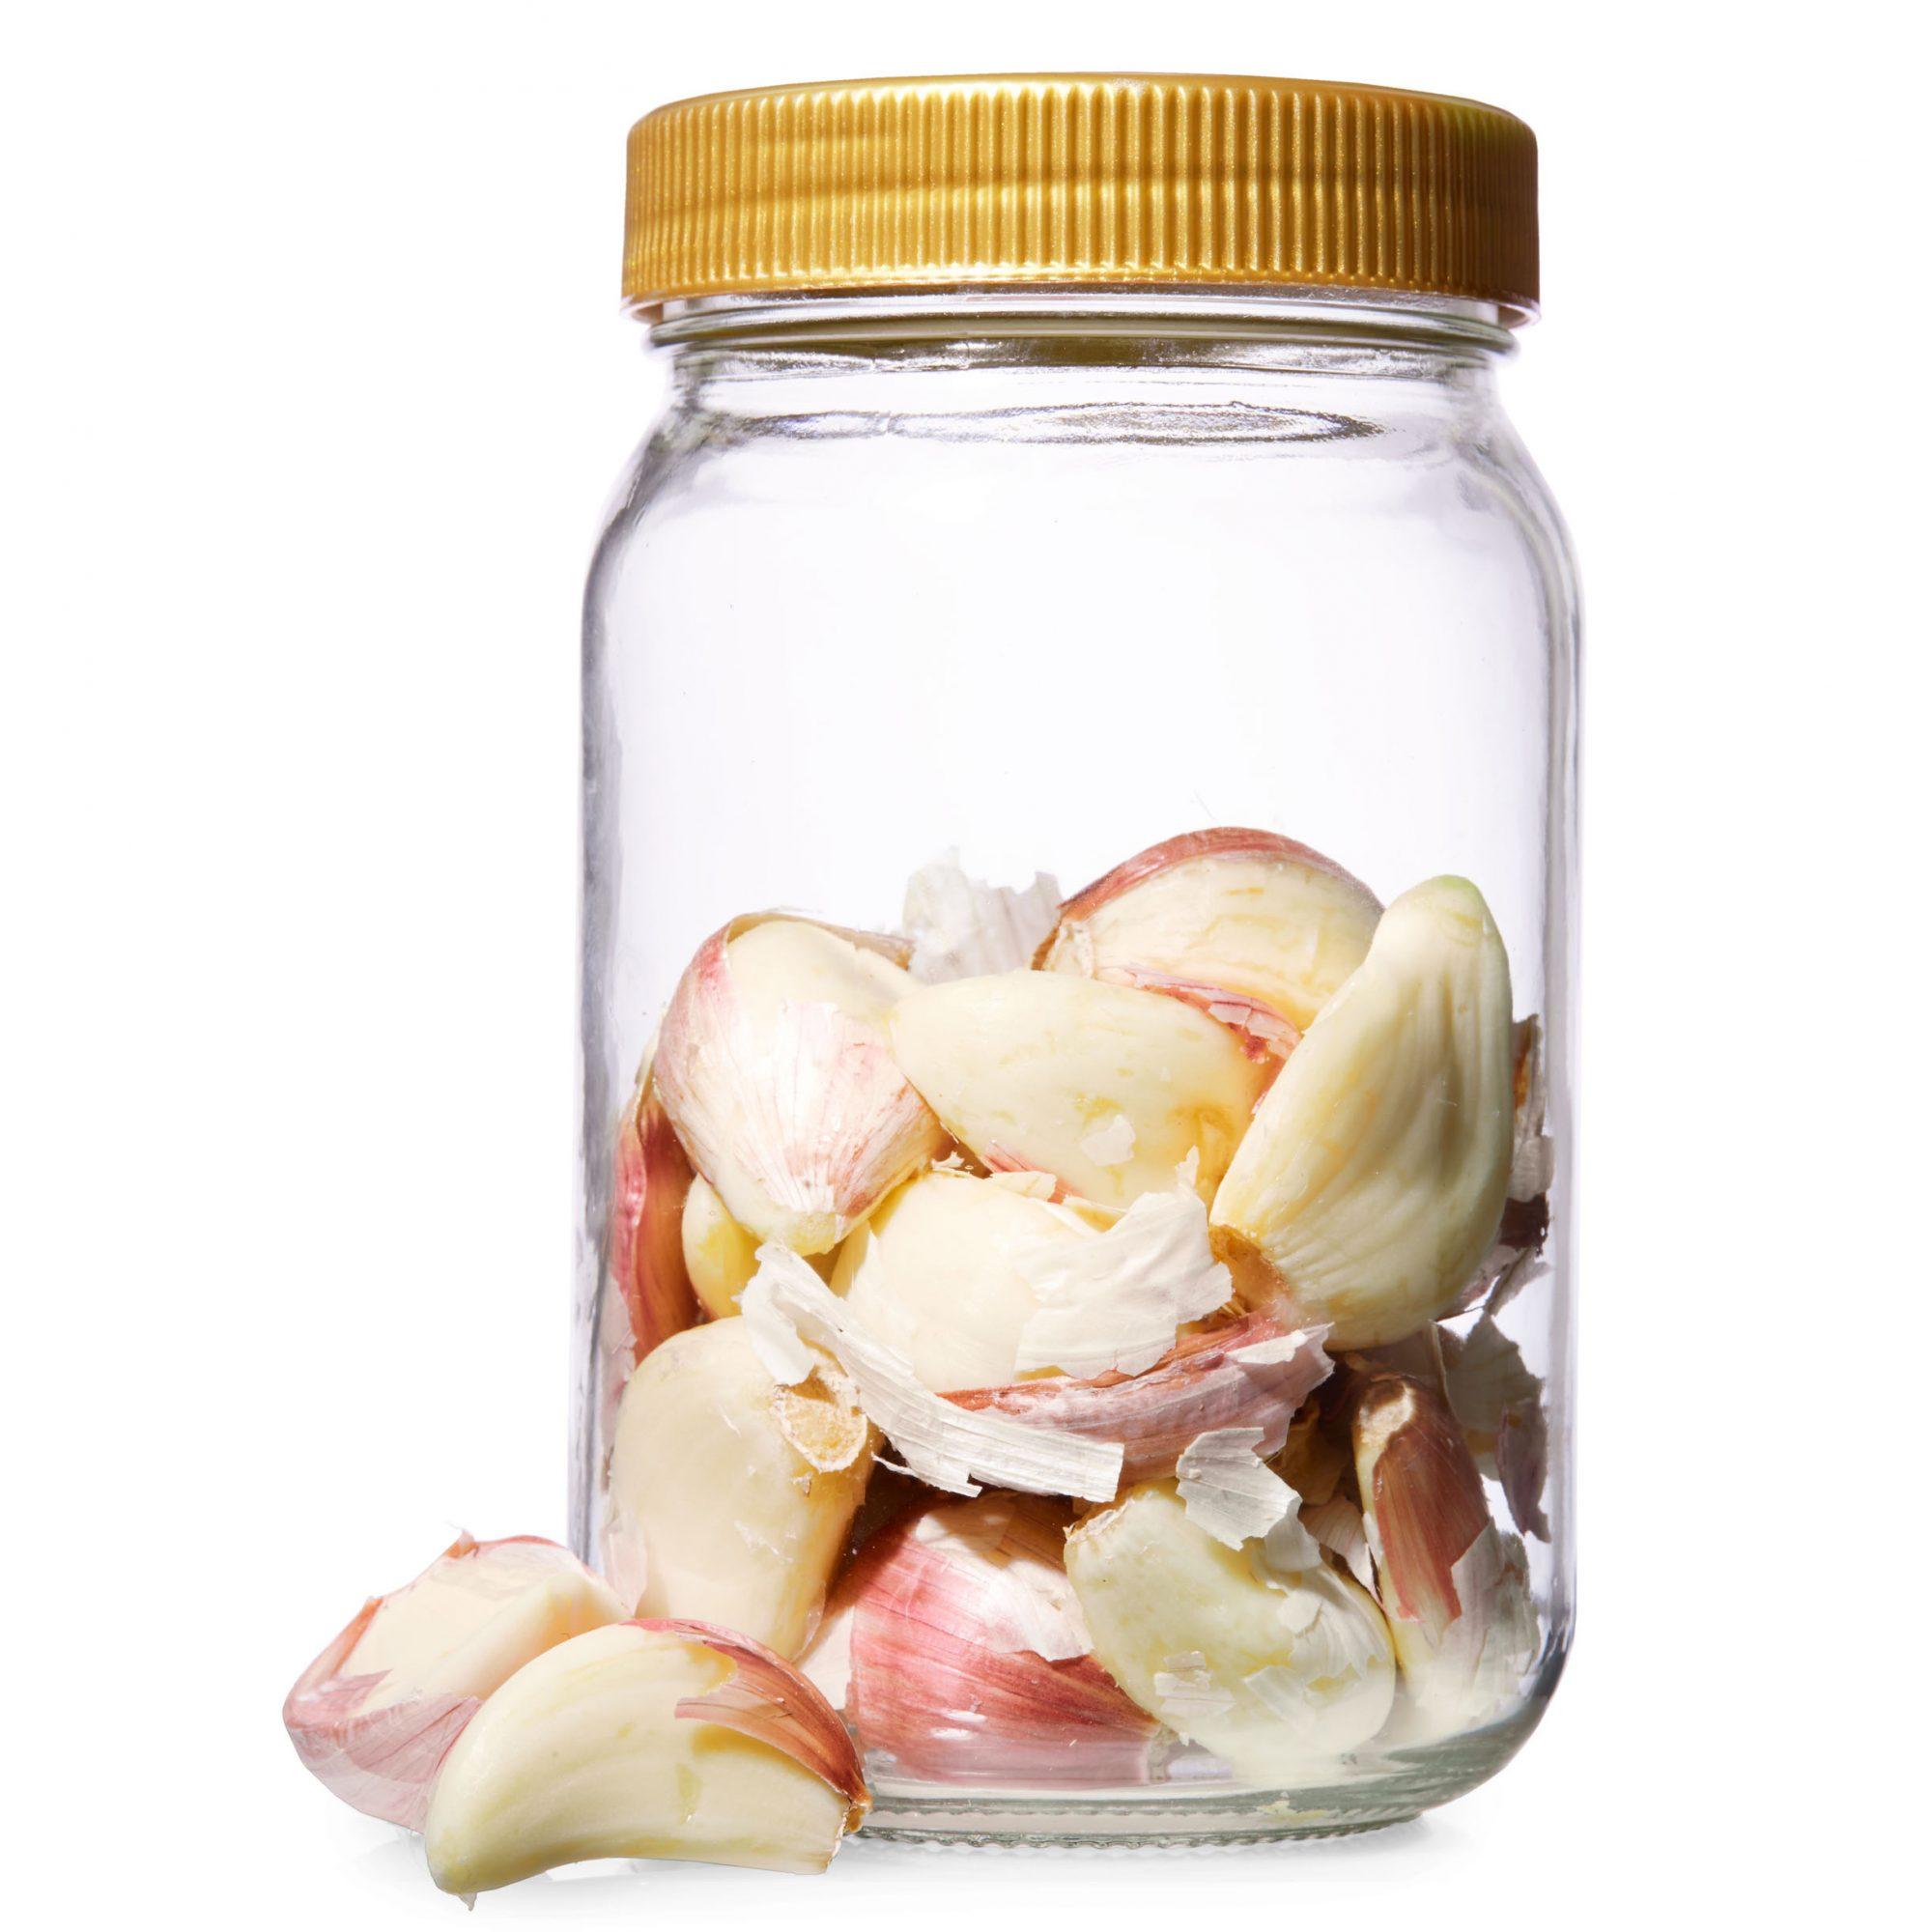 Your New Favorite Garlic Peeling Trick